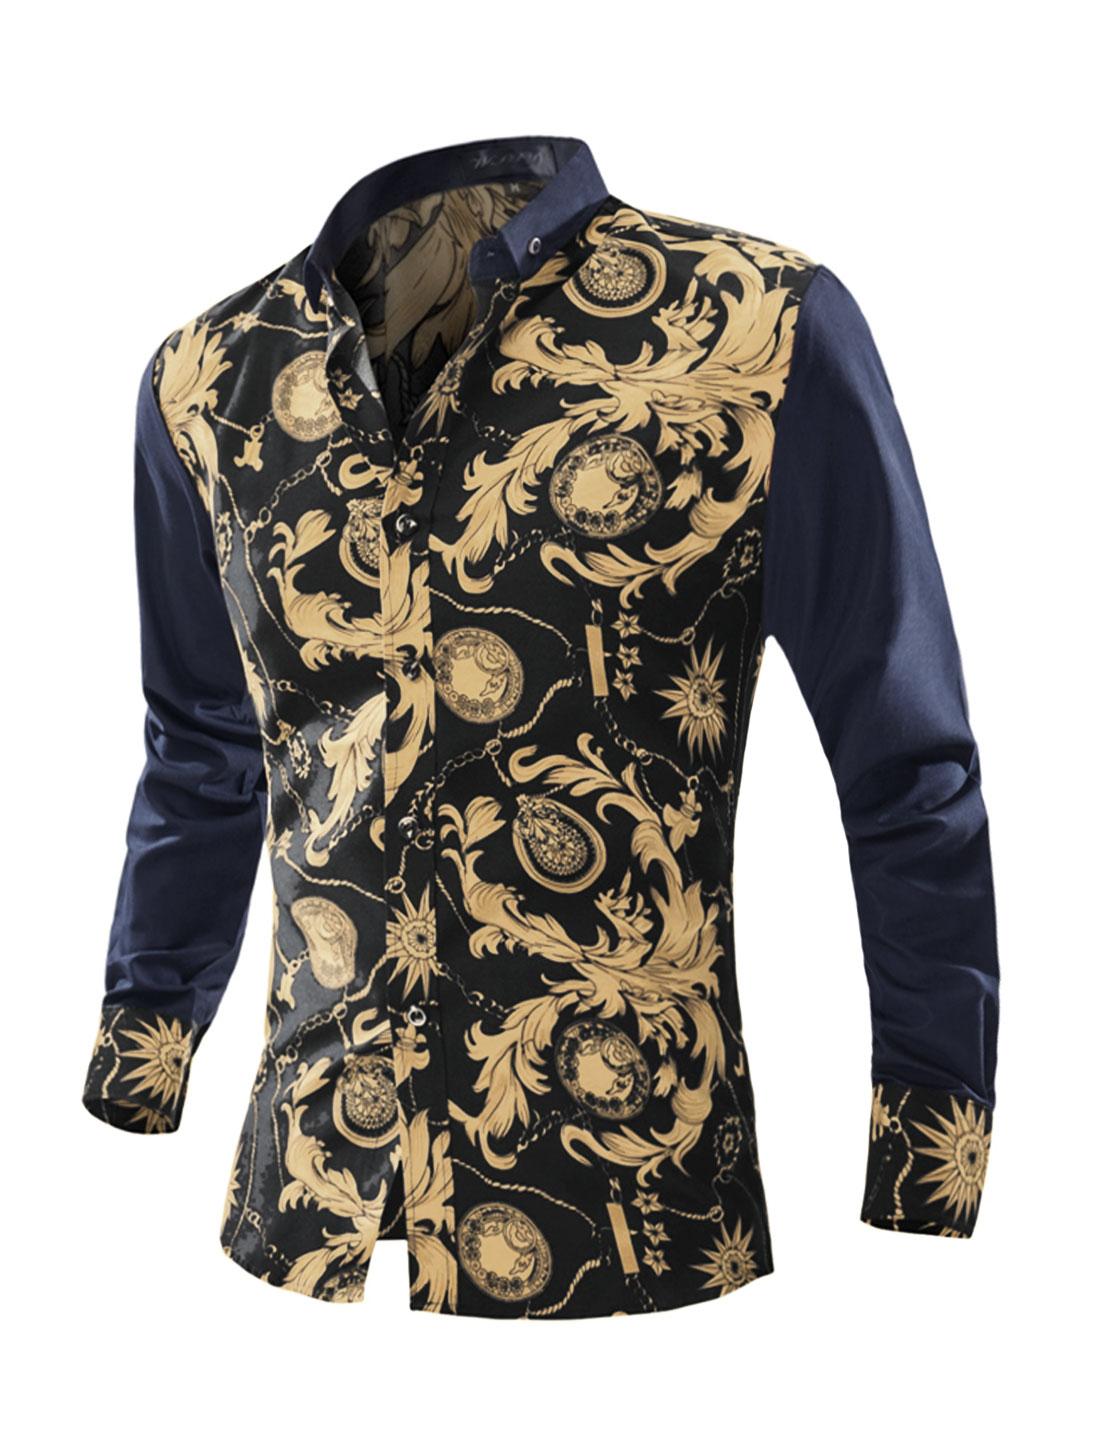 Men Long Sleeves Buttoned Slim Fit Novelty Shirt Black M